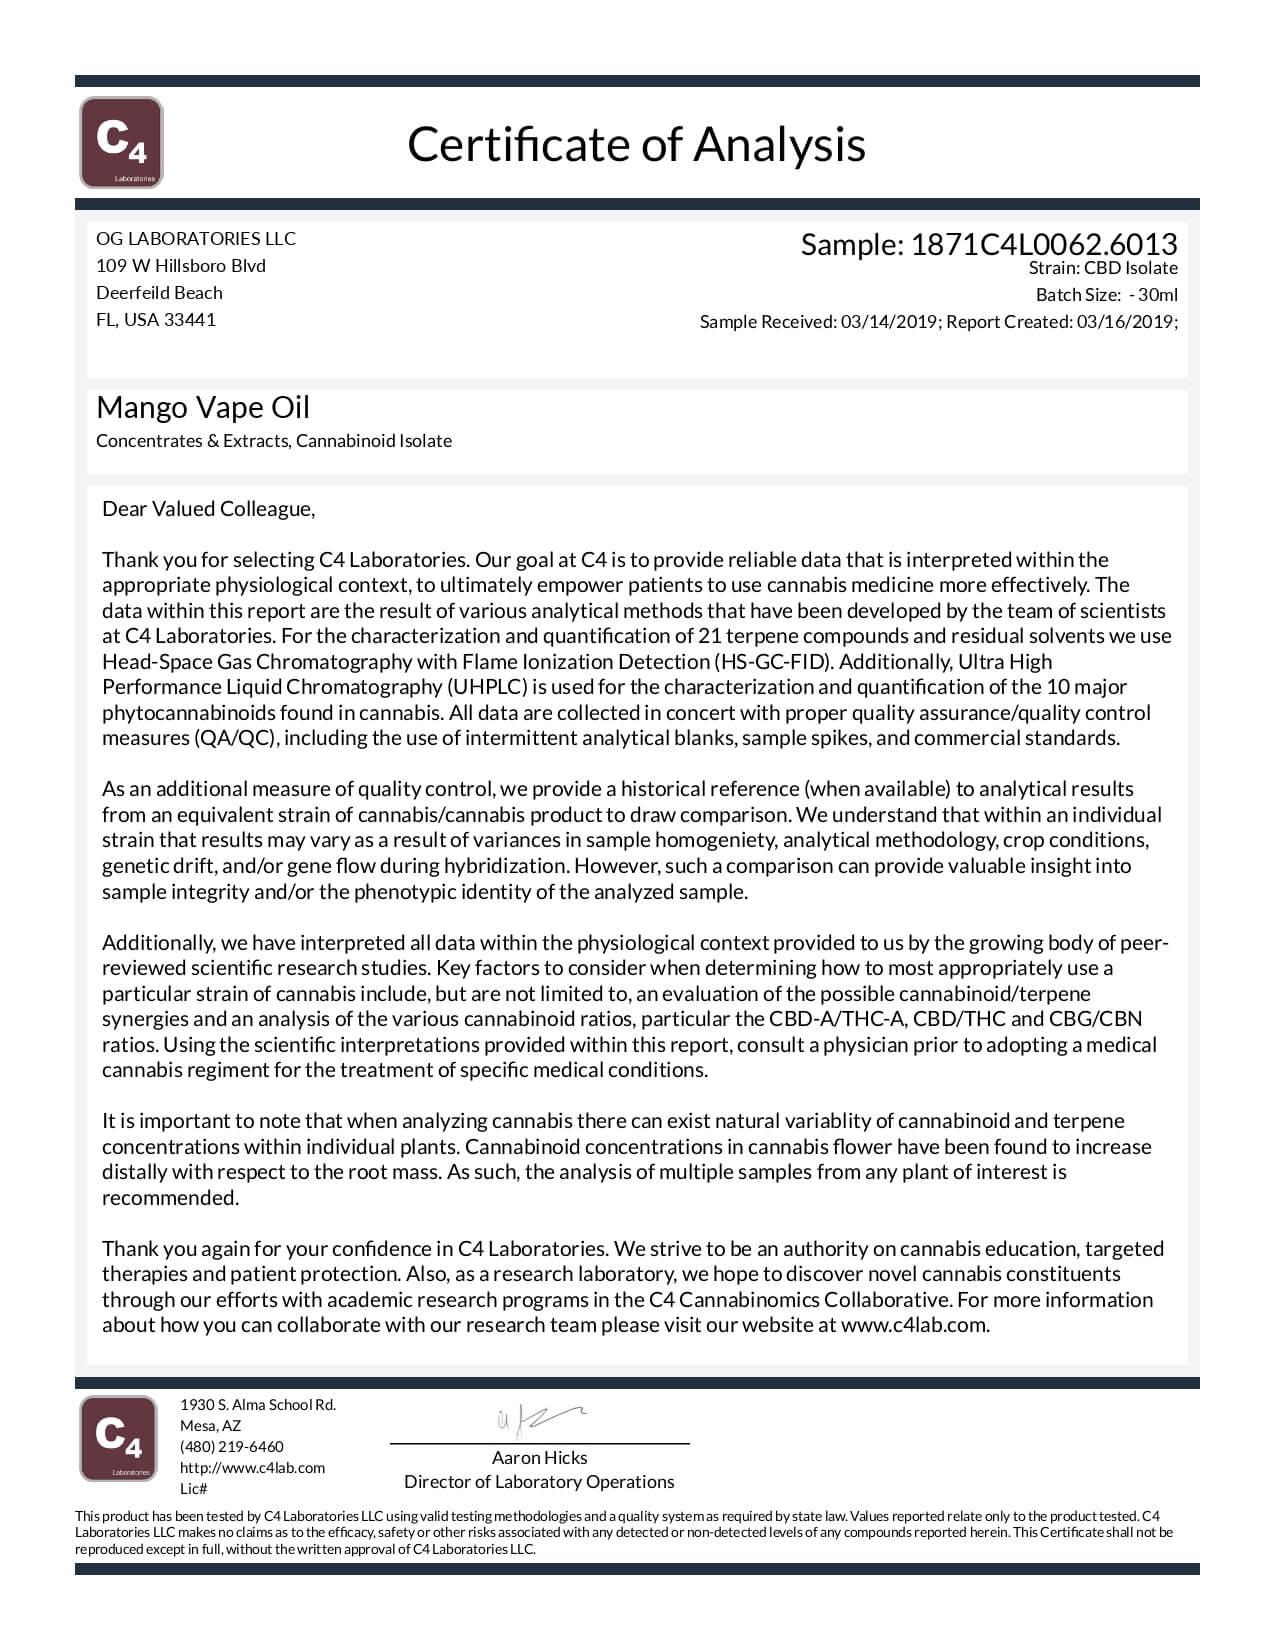 OG Labs CBD Vape Juice Mango 125mg Lab Report